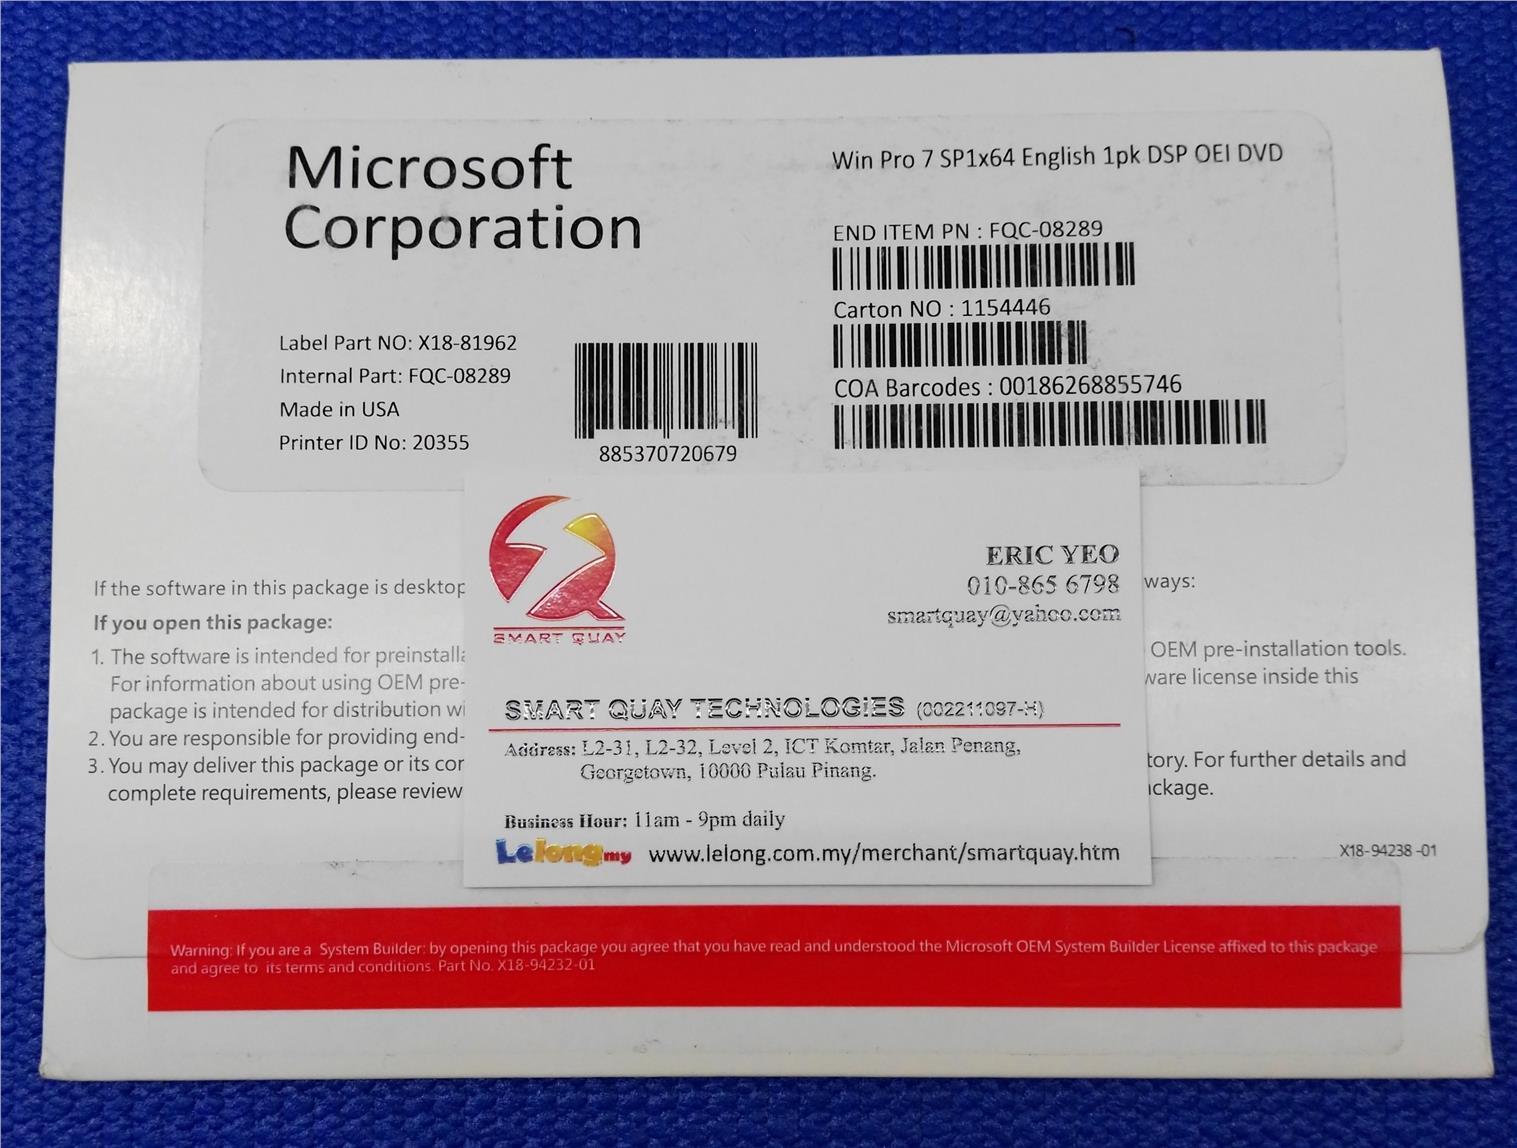 [Stock Clearance] Win Pro 7 SP1x64 English 1pk DSP OEI DVD